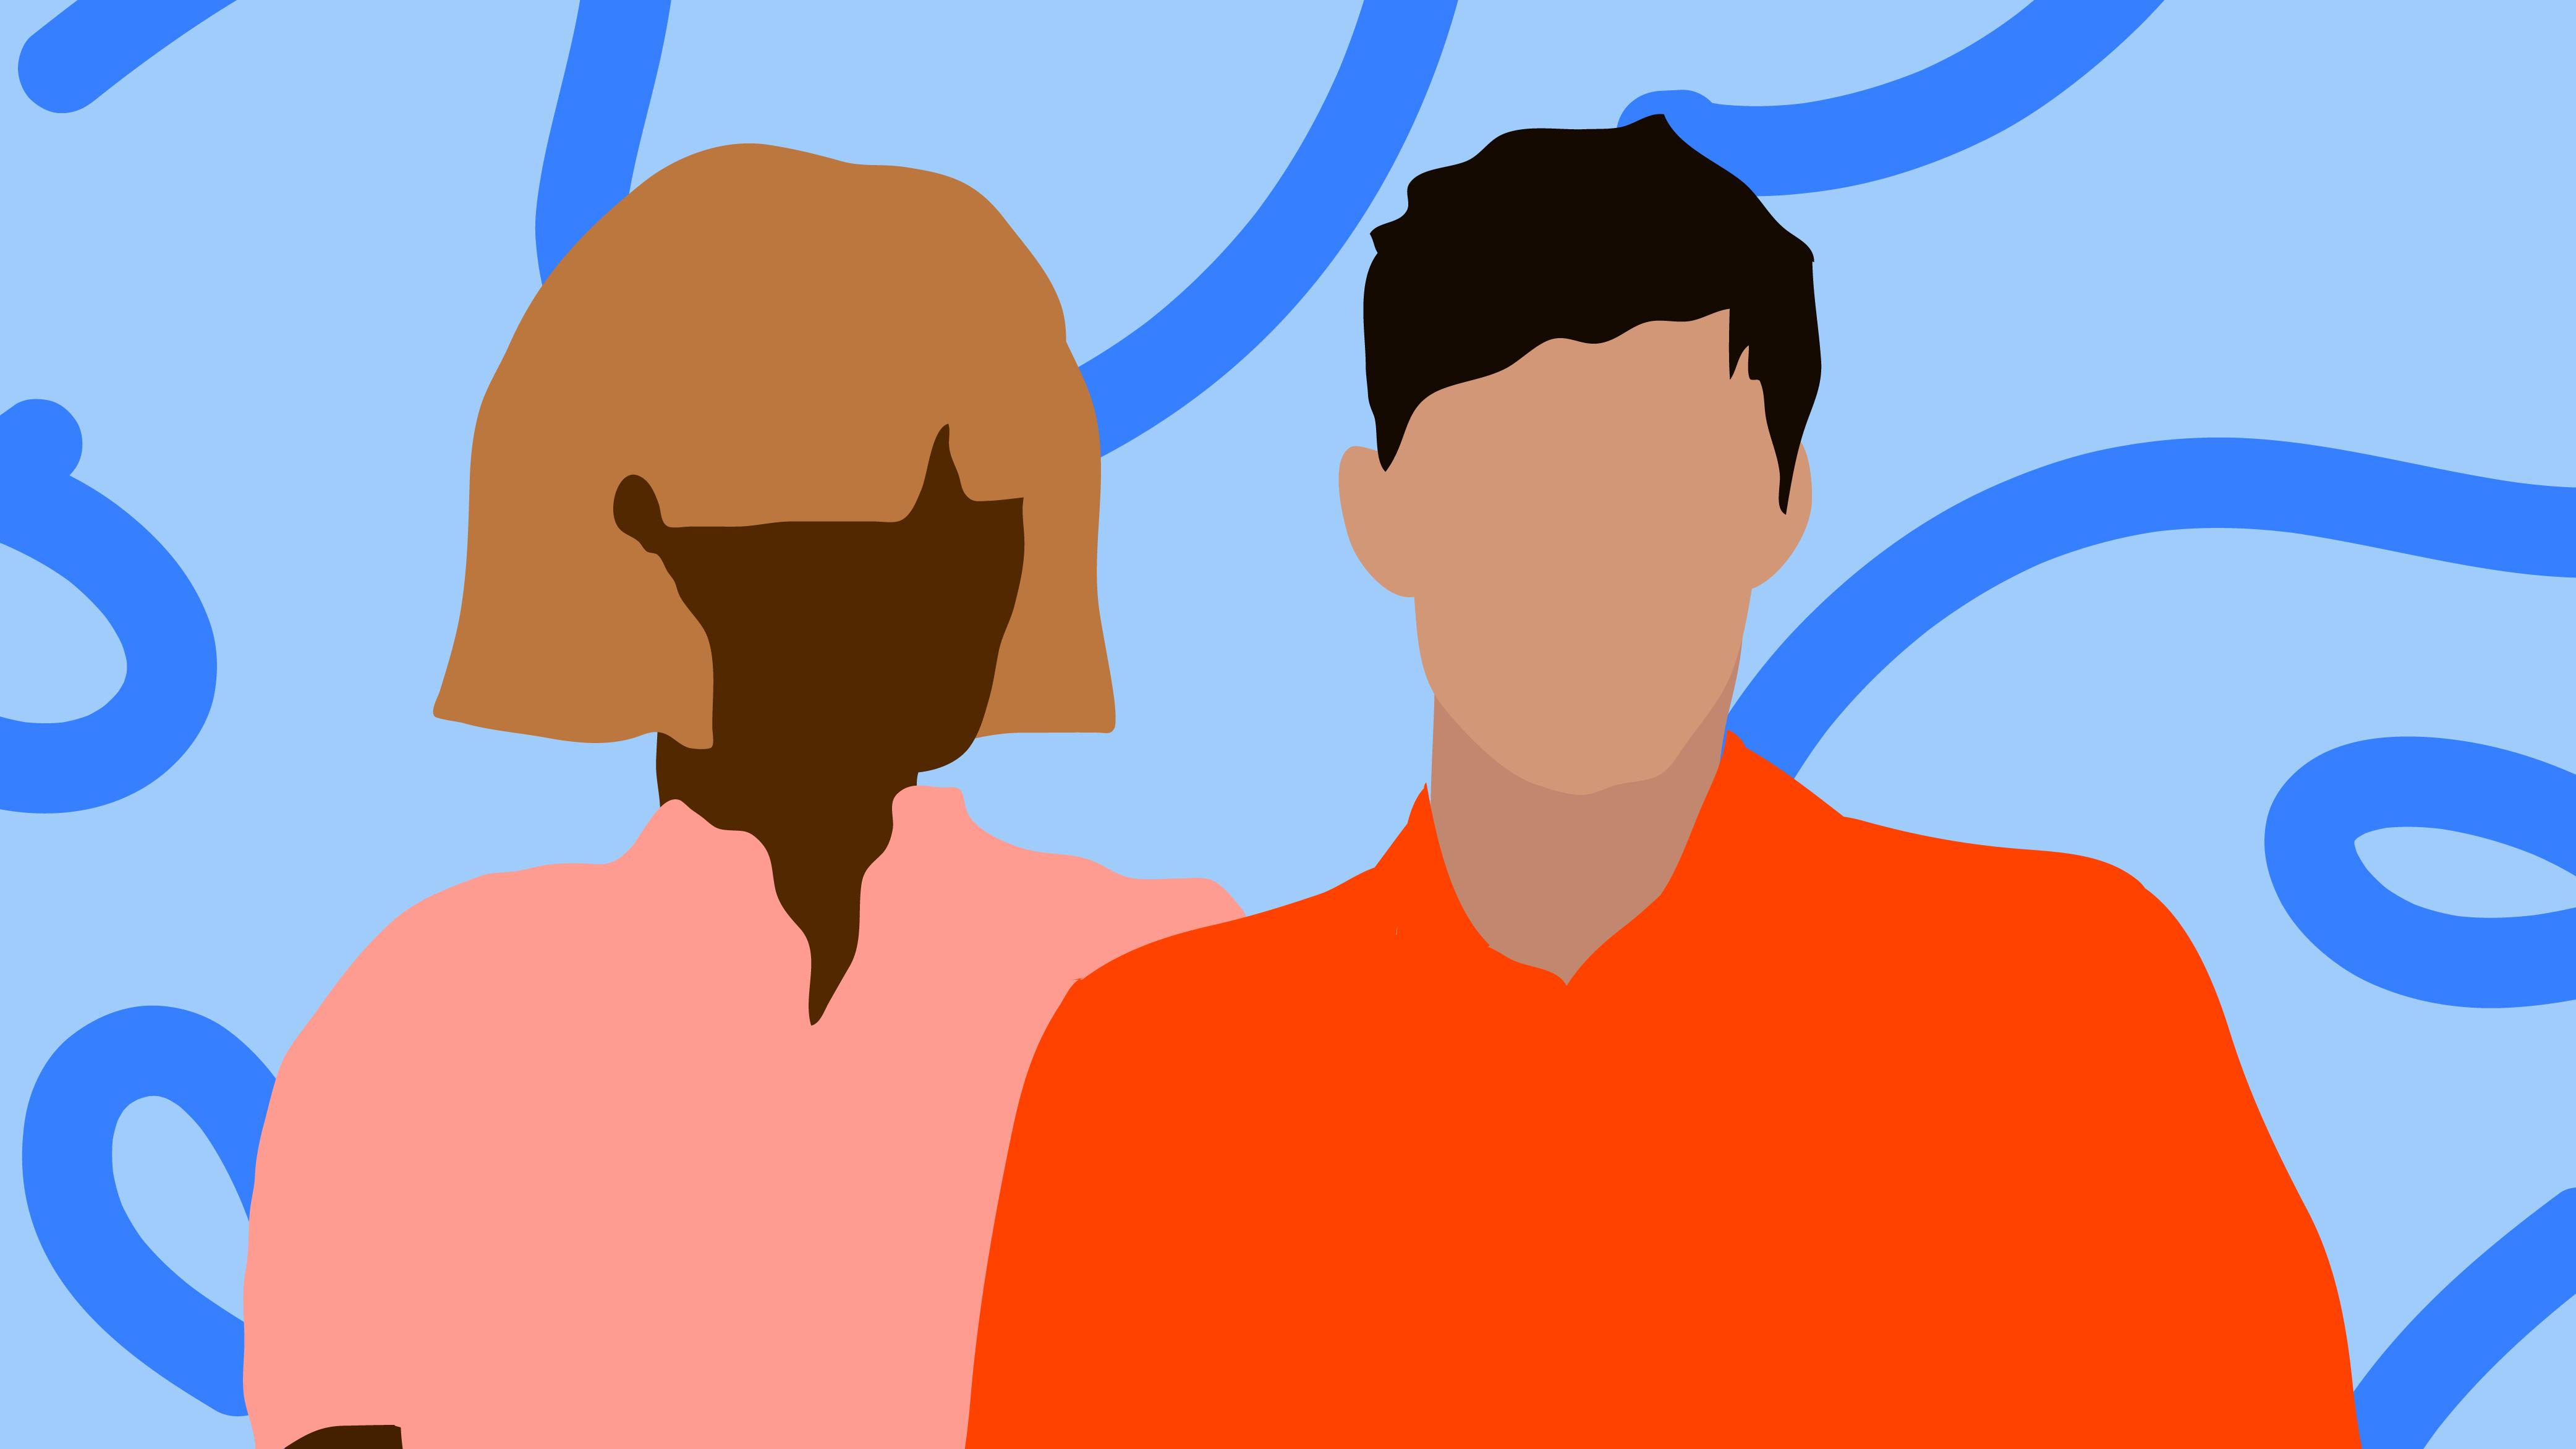 OkCupid datant Persona Slow Dancer